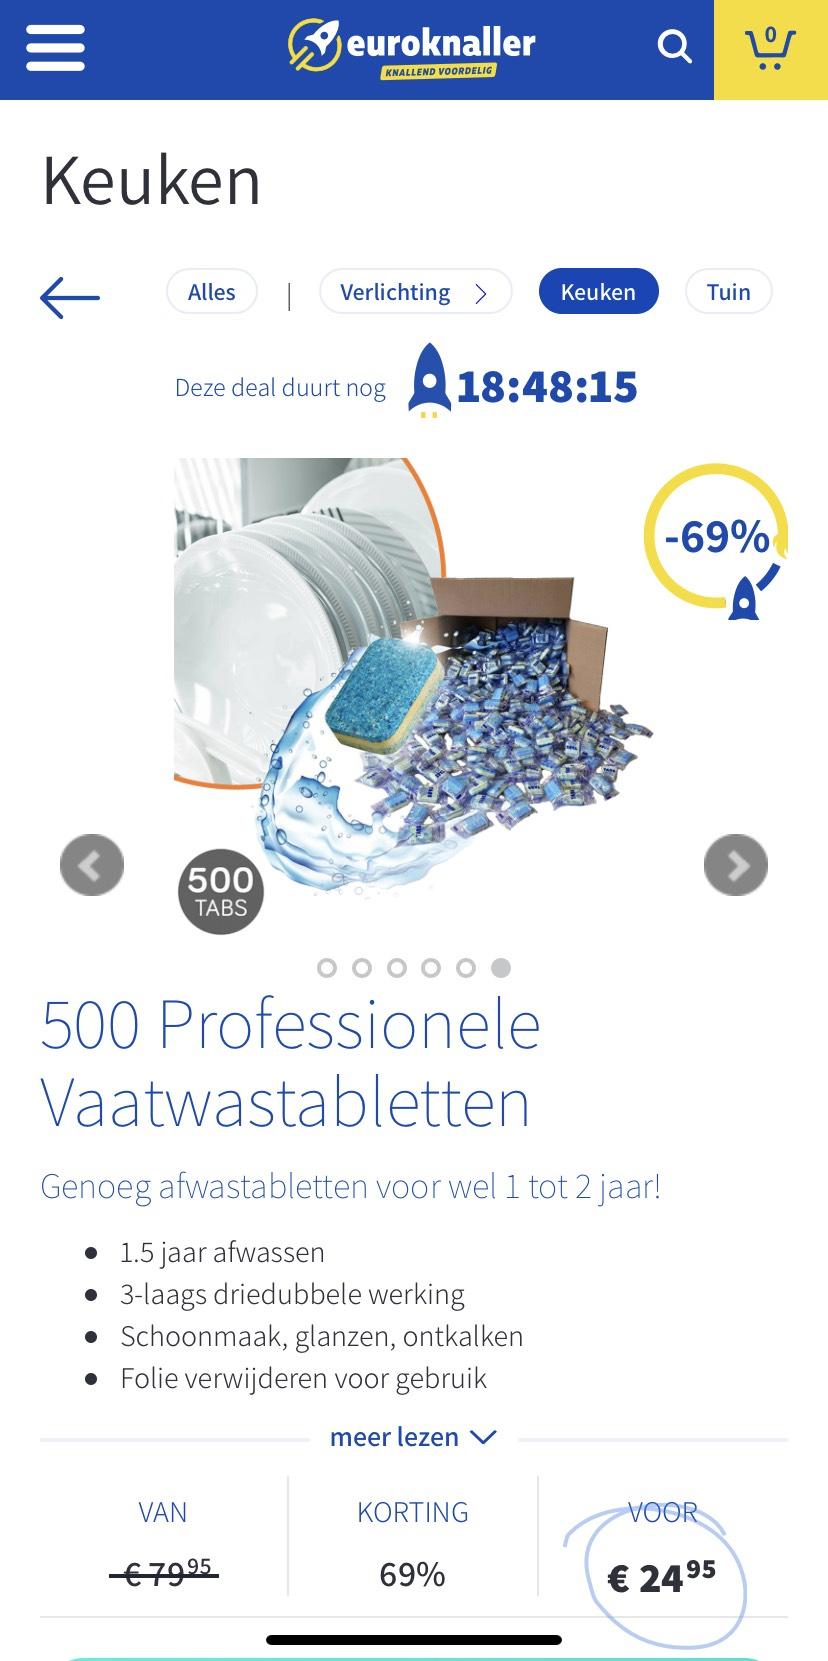 Euroknaller.nl 500 Vaatwastabletten